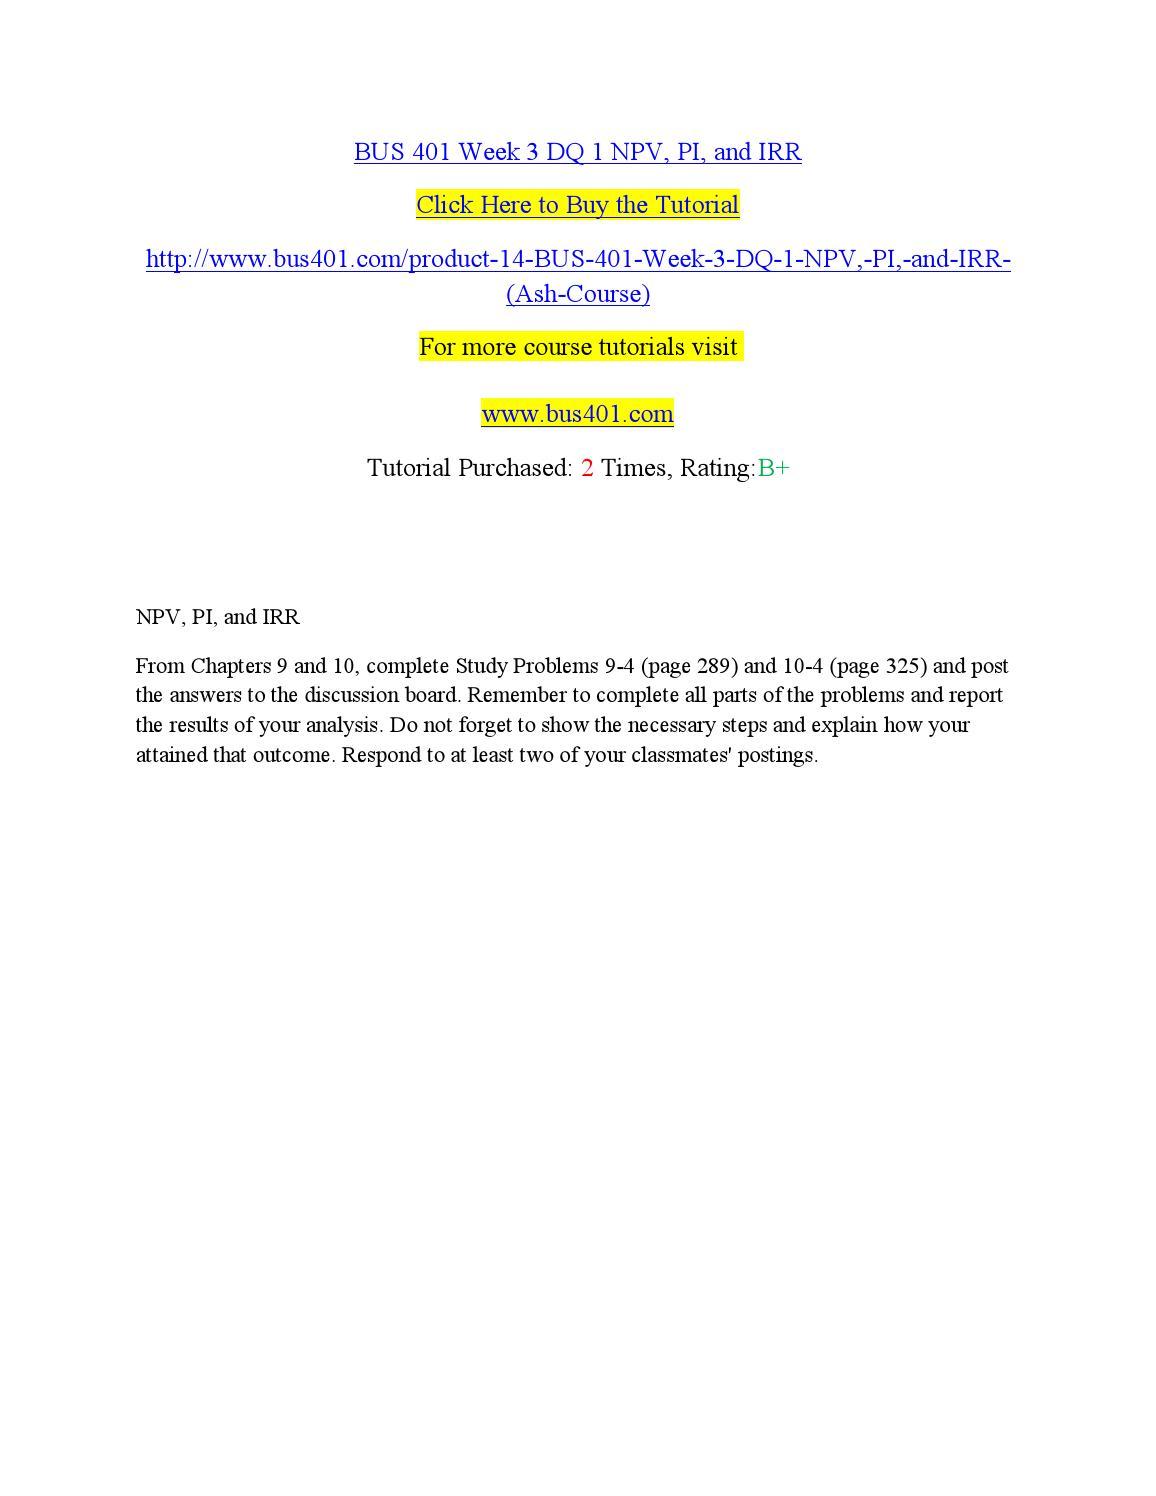 GSCM 334 Mtls Resource & Cap Pln wLab Week All weeks DQs Checkpoint Homework Lab Final Exam Answer